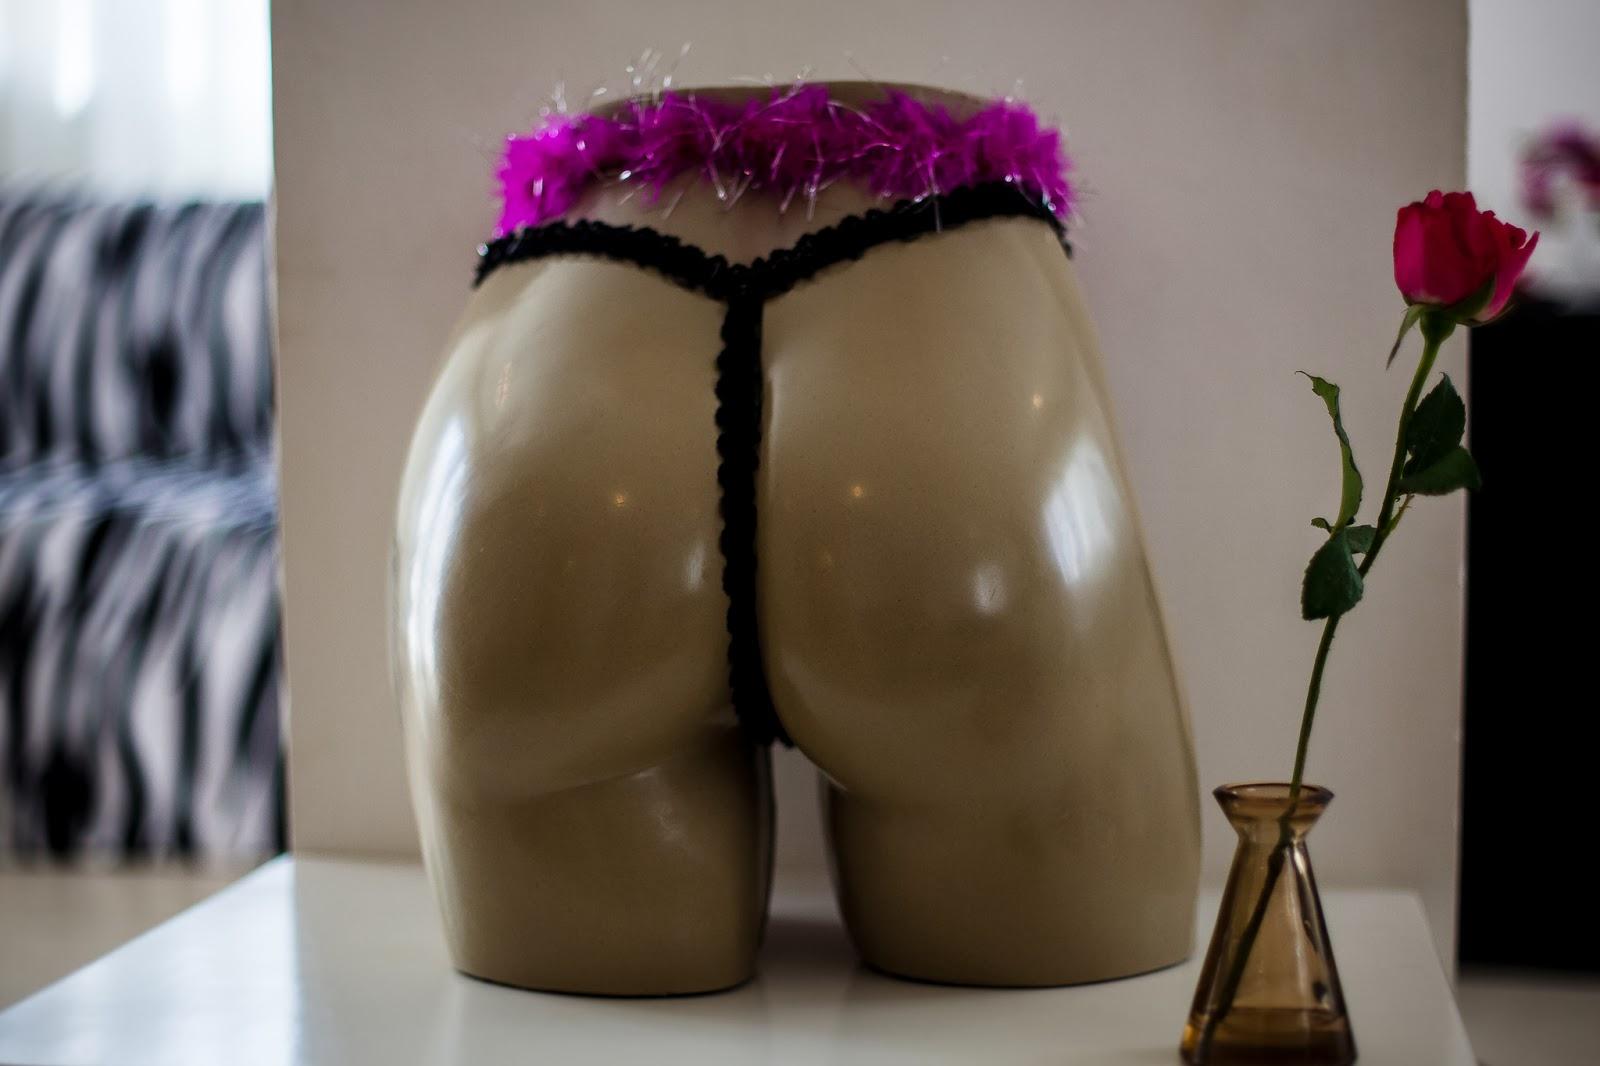 cha-lingerie-decoracao-manequim-3